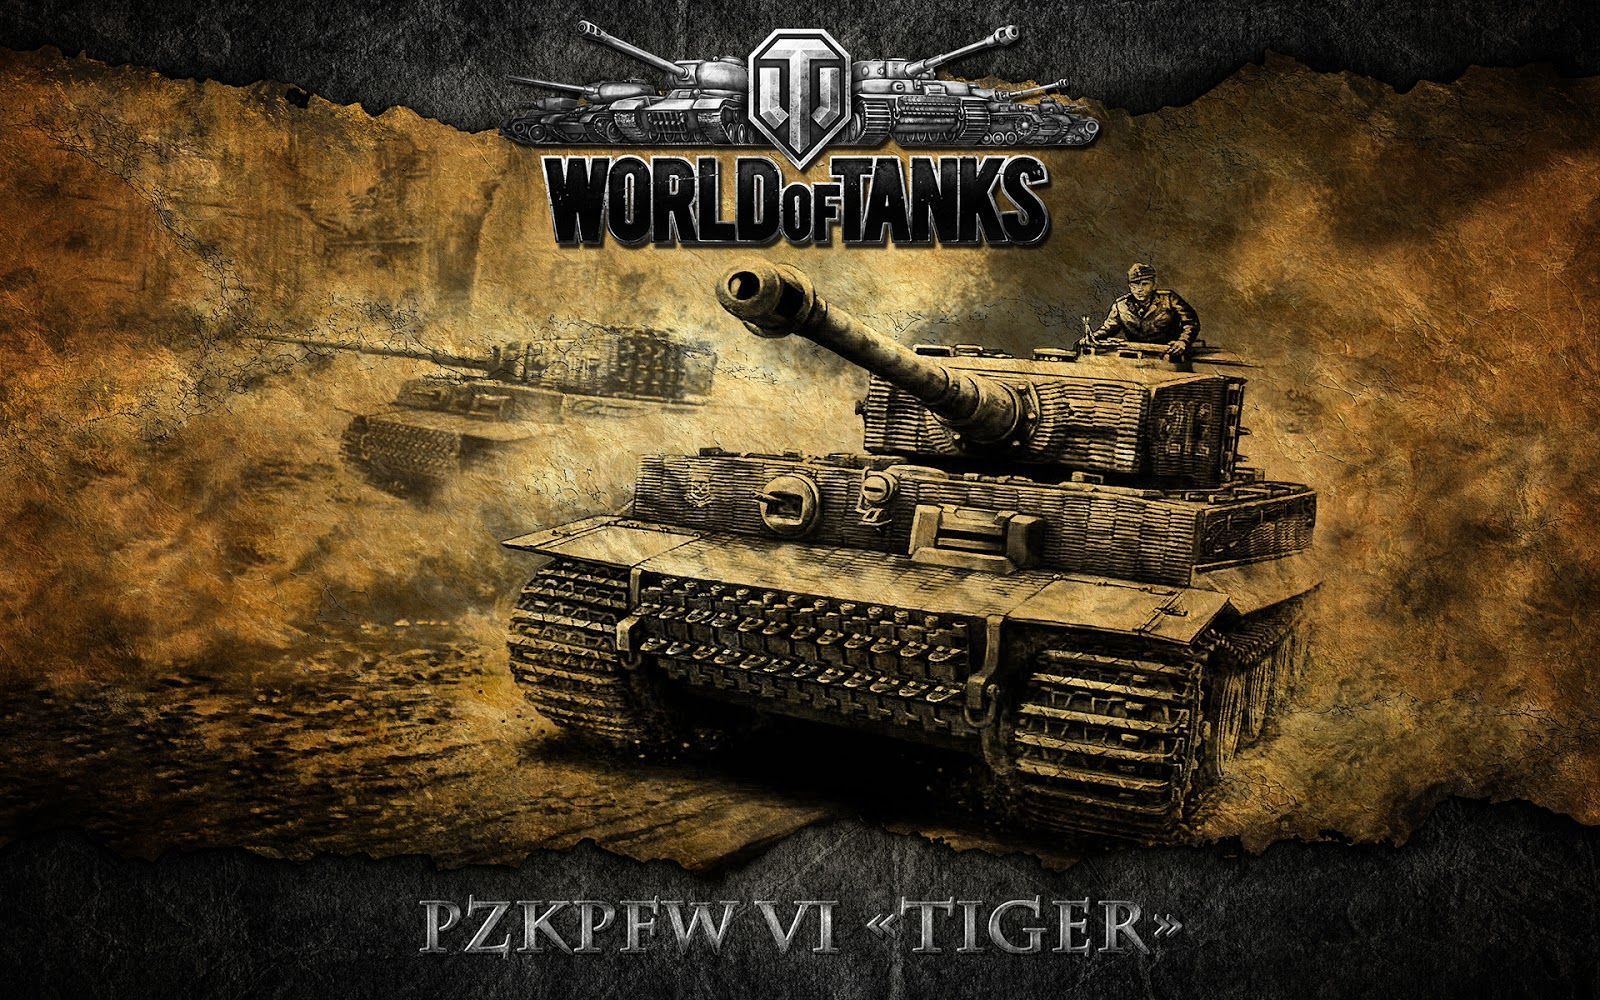 Ворлд оф танкс фото танков - f3e49